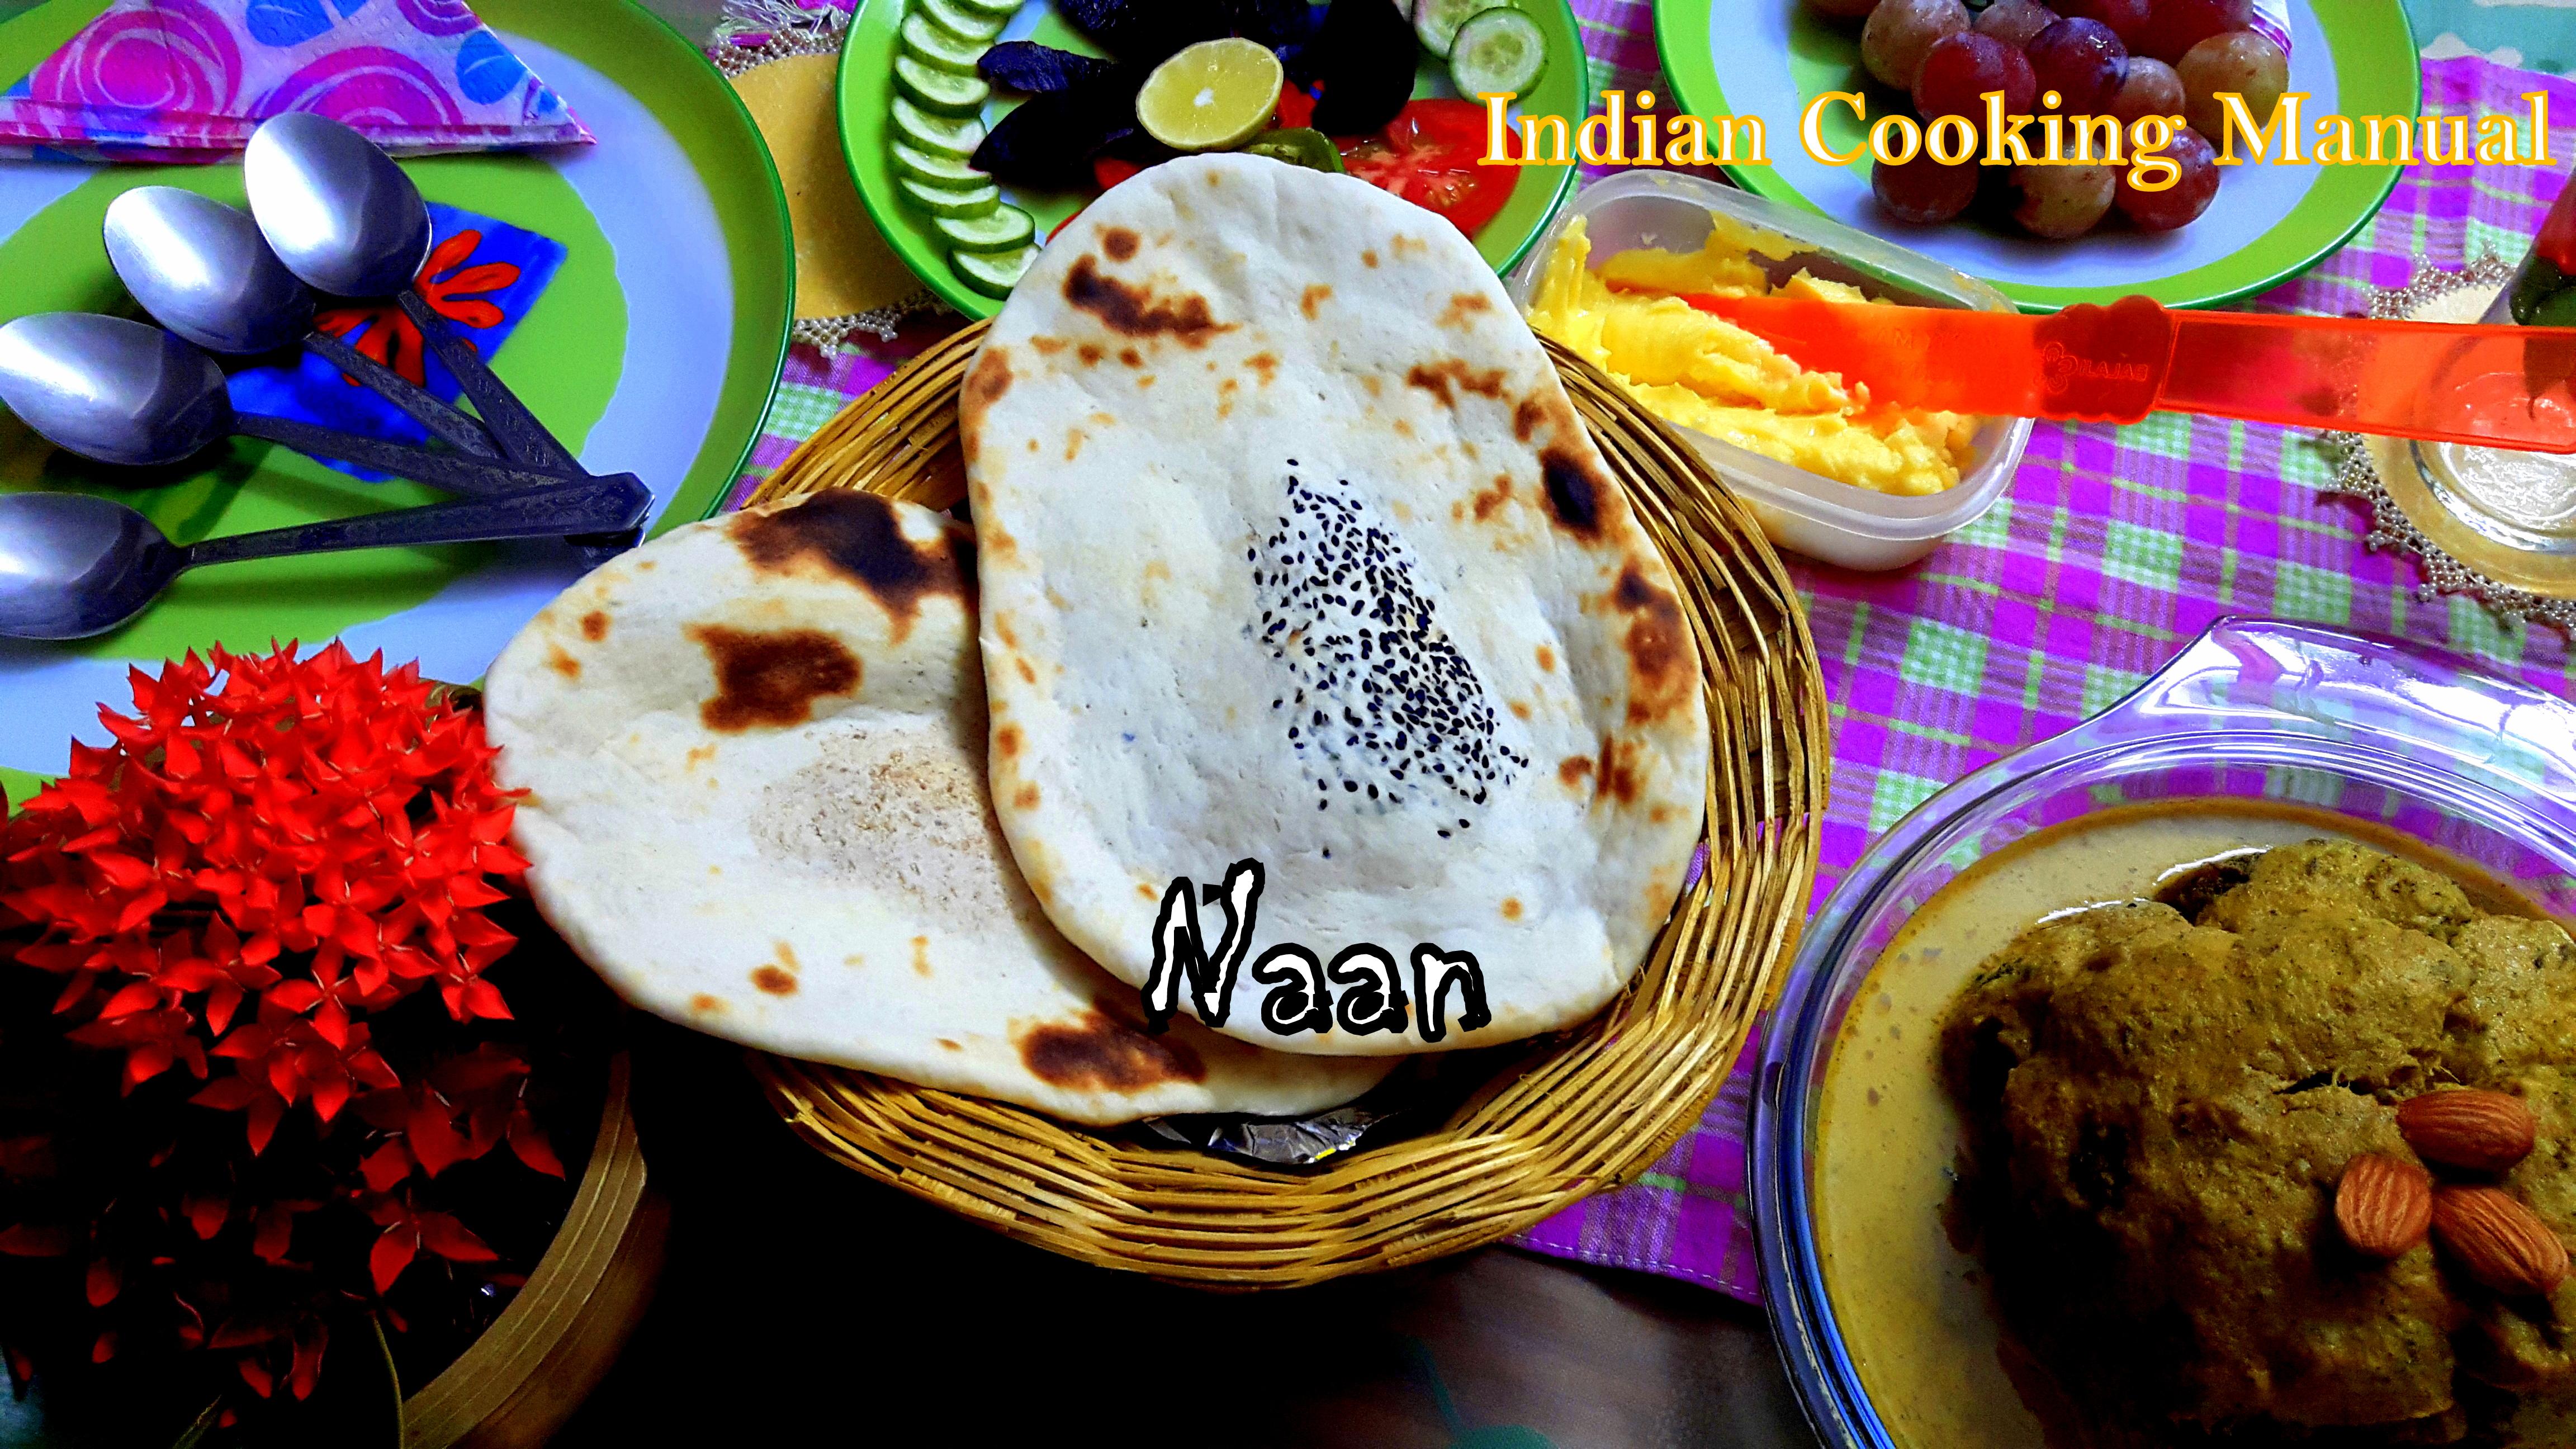 Naan (Indian bread)